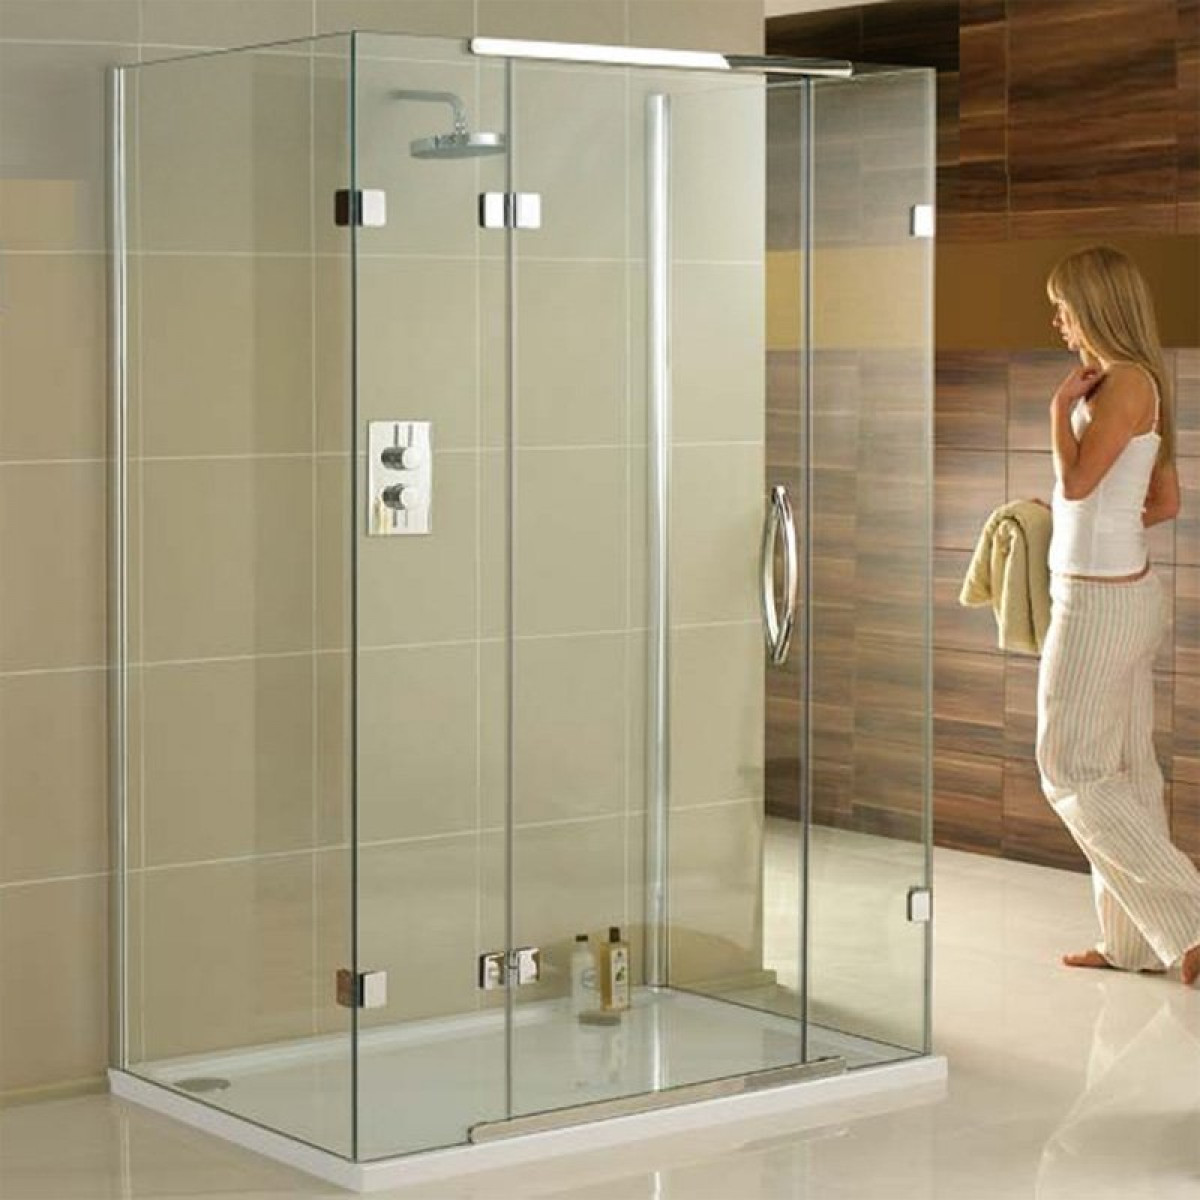 Aquadart 1200 x 800mm 3 sided shower enclosure for 1200 shower door 8mm glass